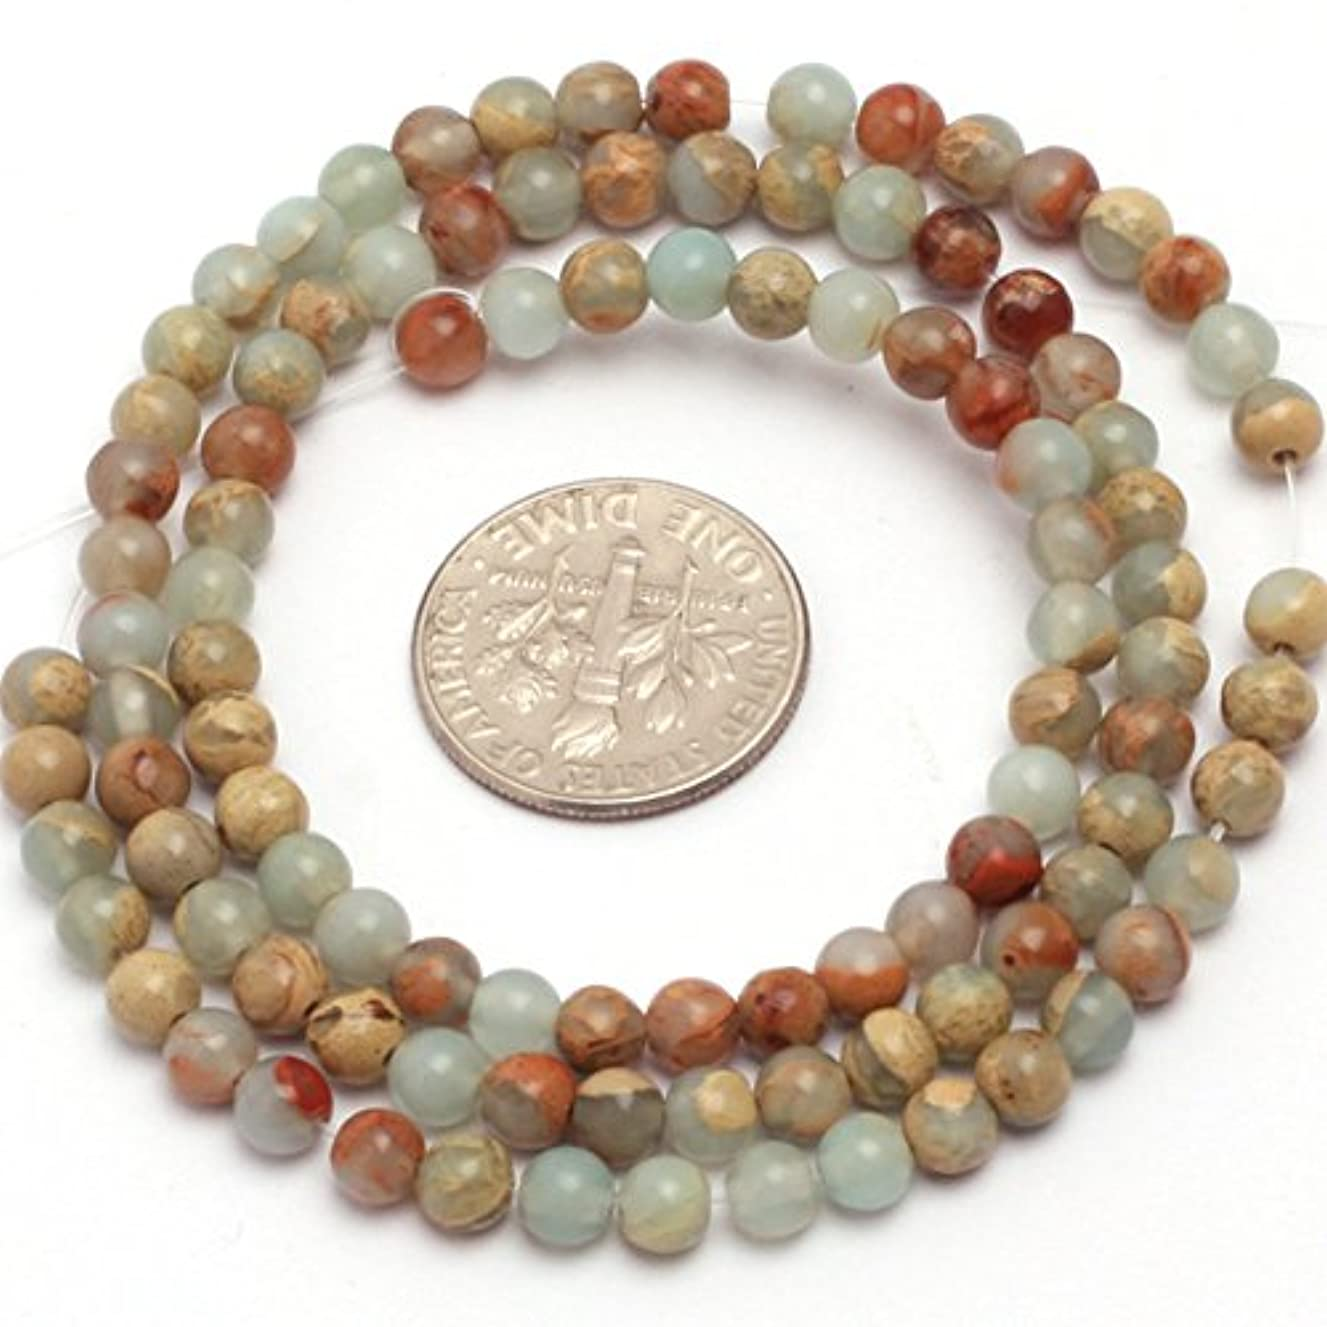 JOE FOREMAN 4mm Shoushan Semi Precious Gemstone Round Loose Beads for Jewelry Making DIY Handmade Craft Supplies 15